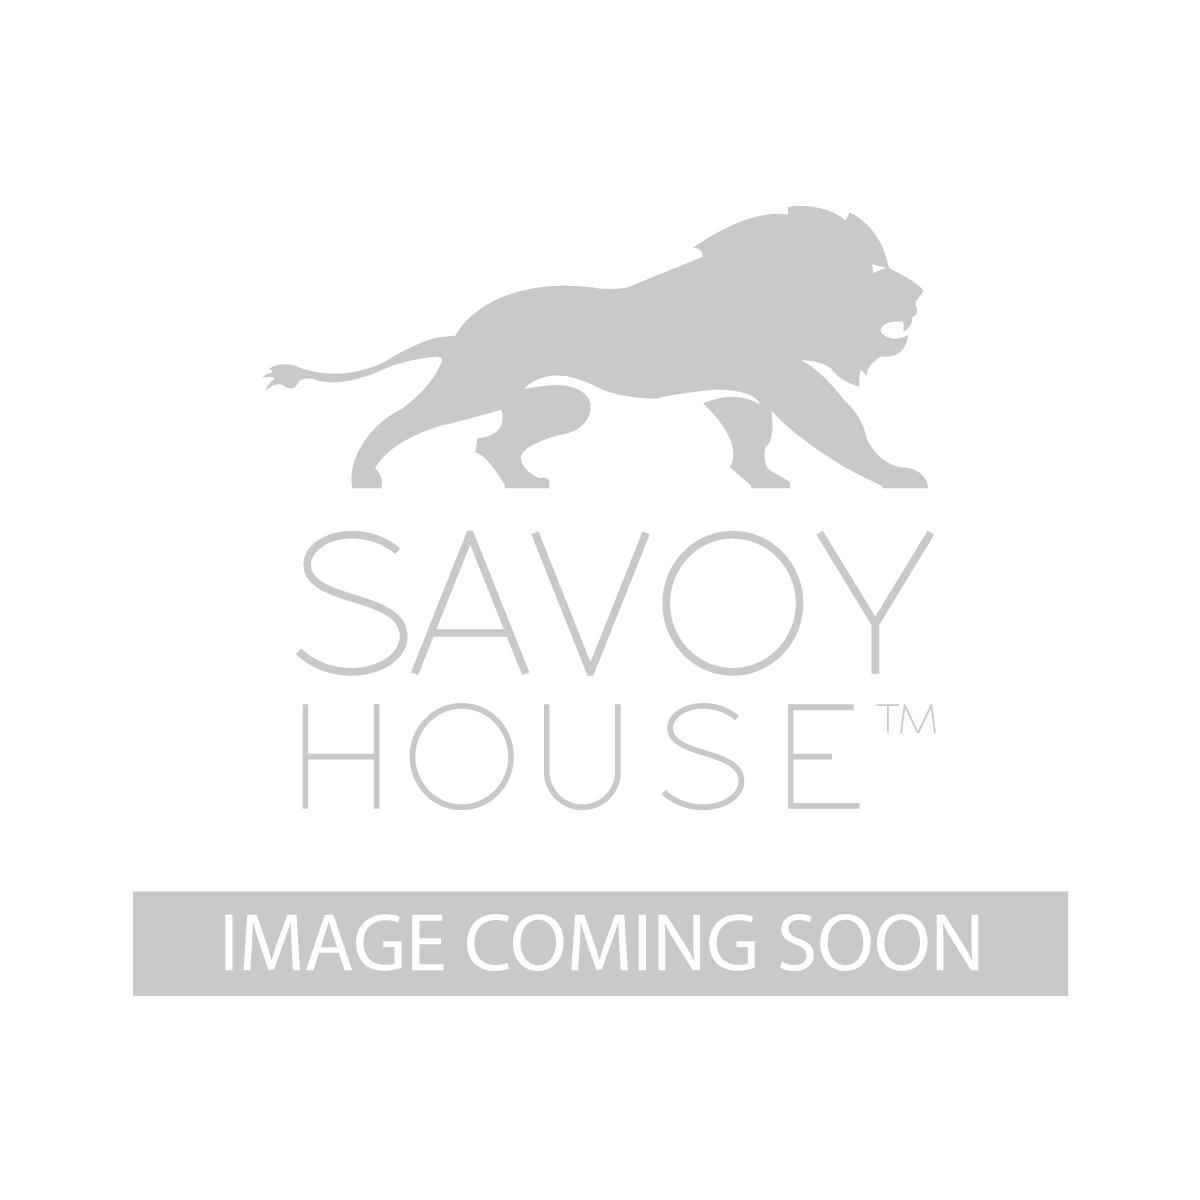 8 9053 4 sn handel 4 light bath bar by savoy house handel 4 light bath bar aloadofball Images